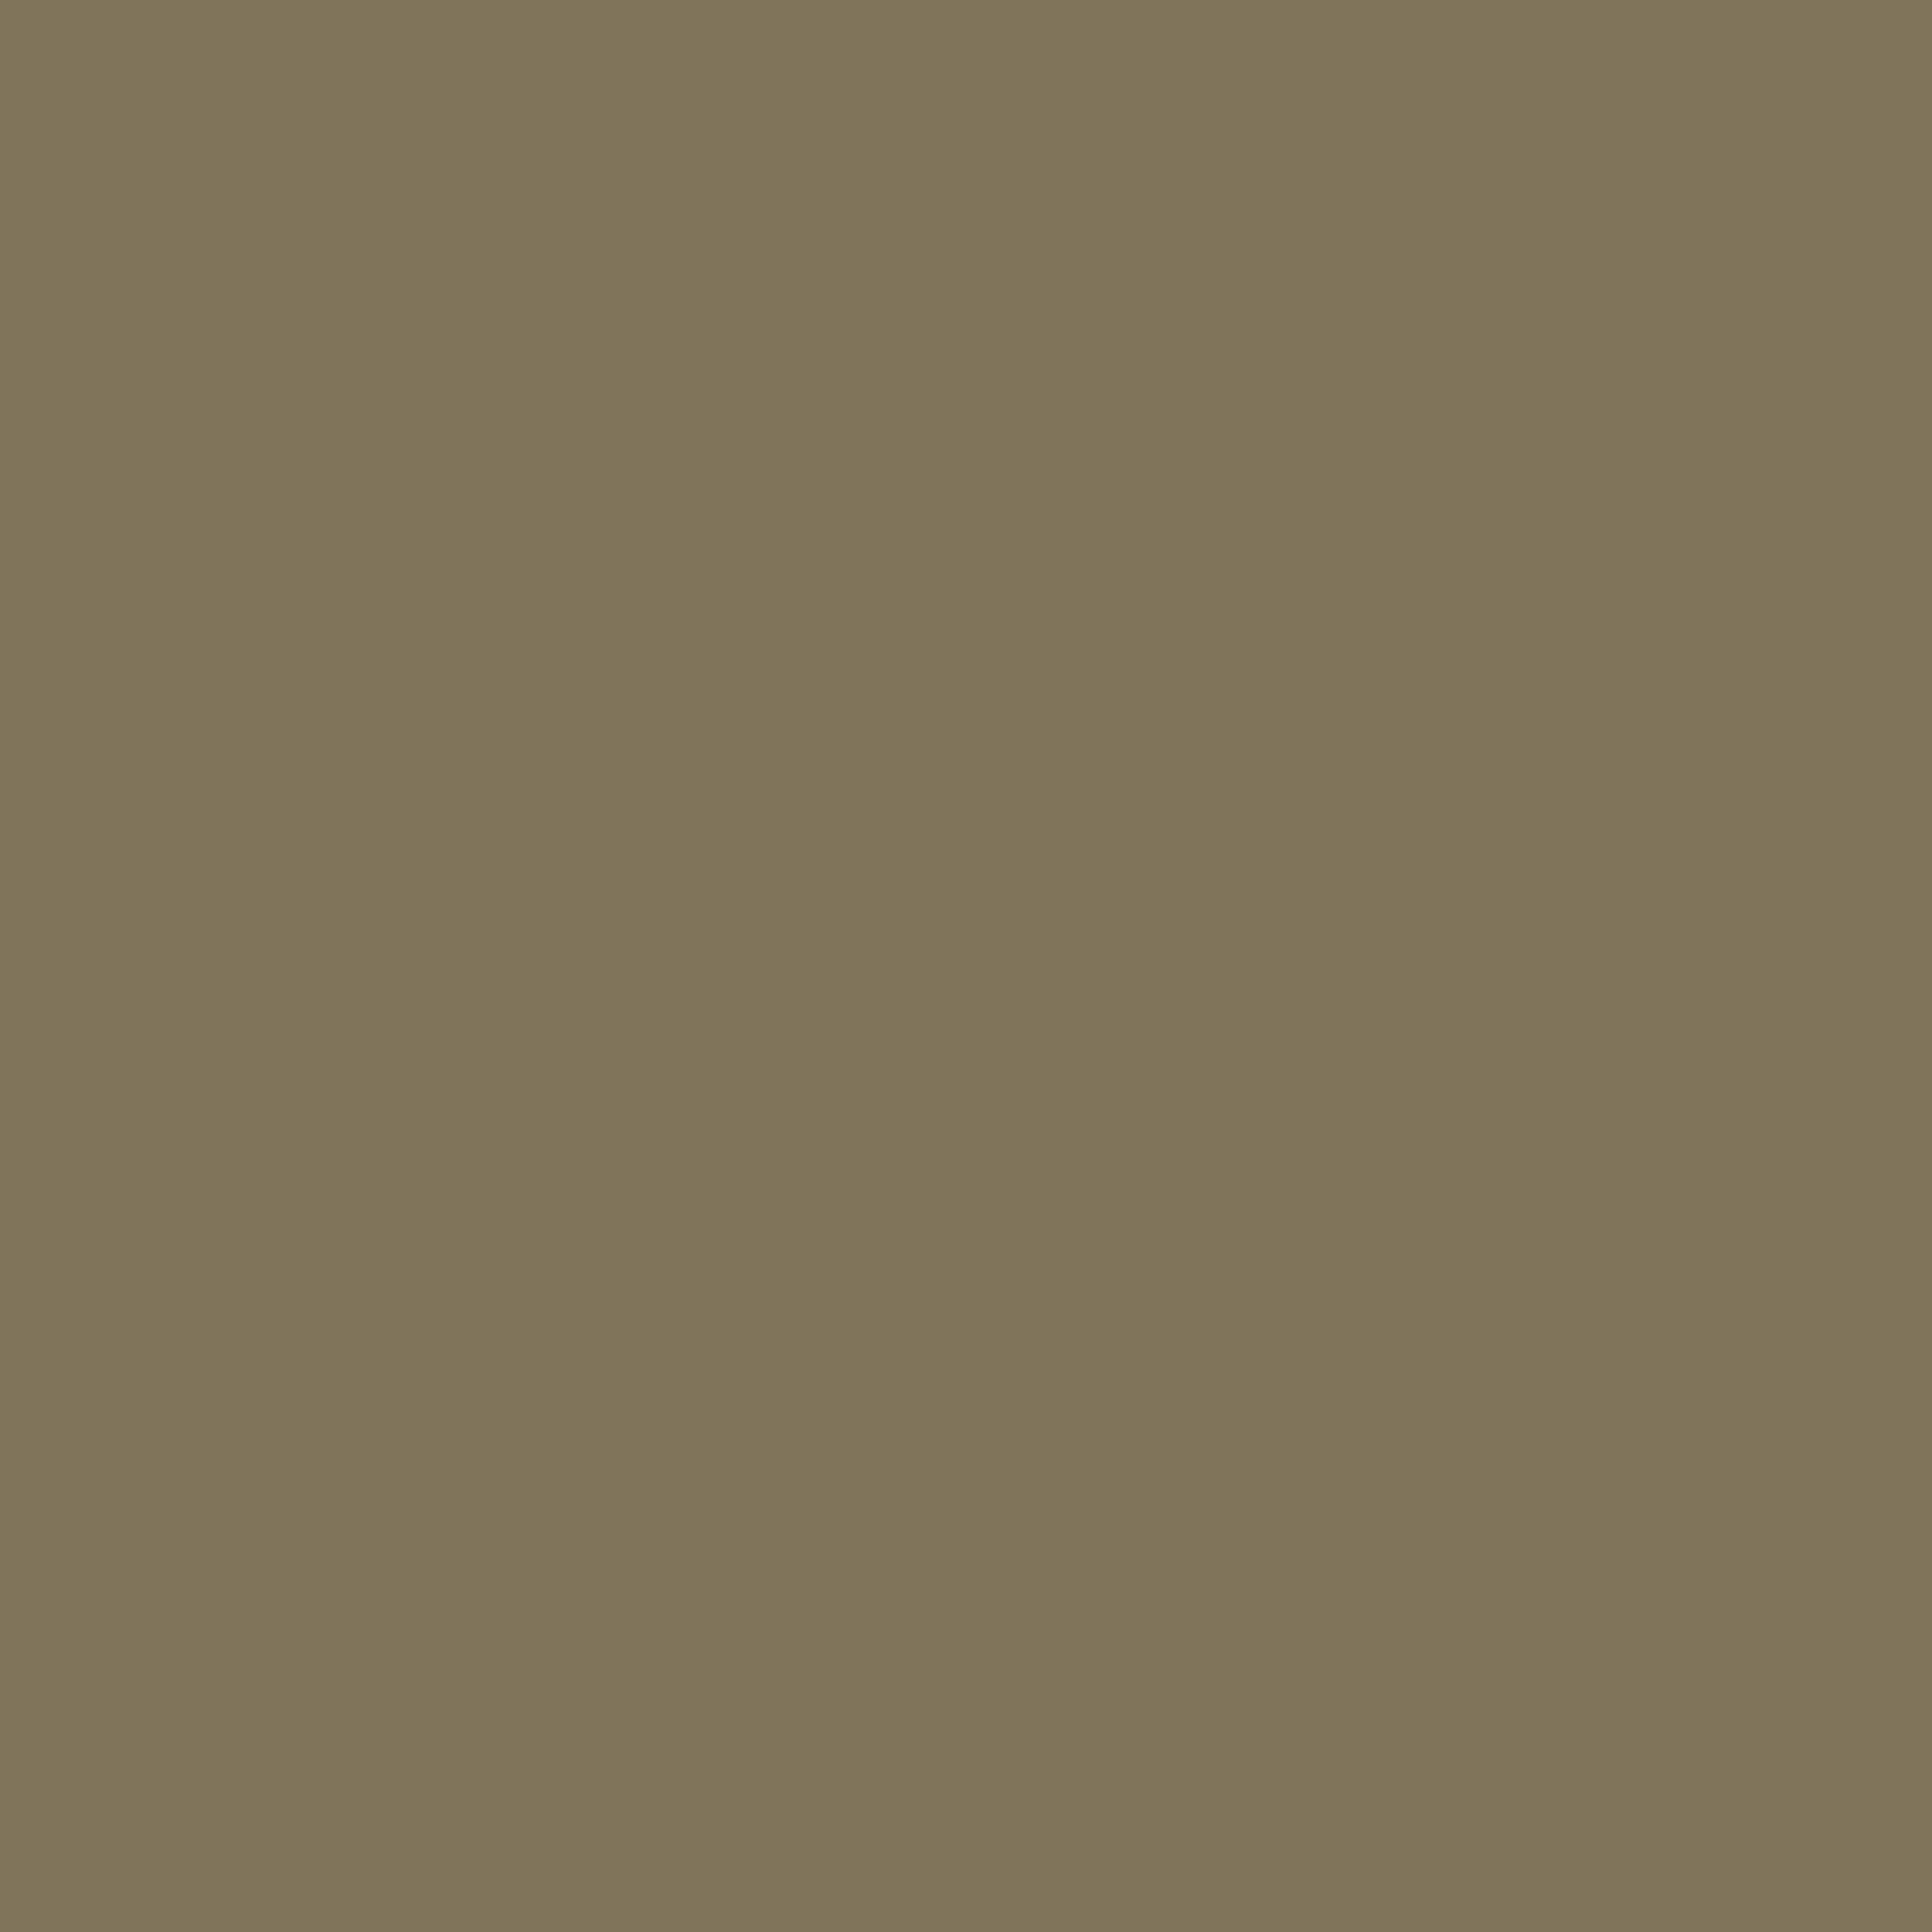 2048x2048 Spanish Bistre Solid Color Background